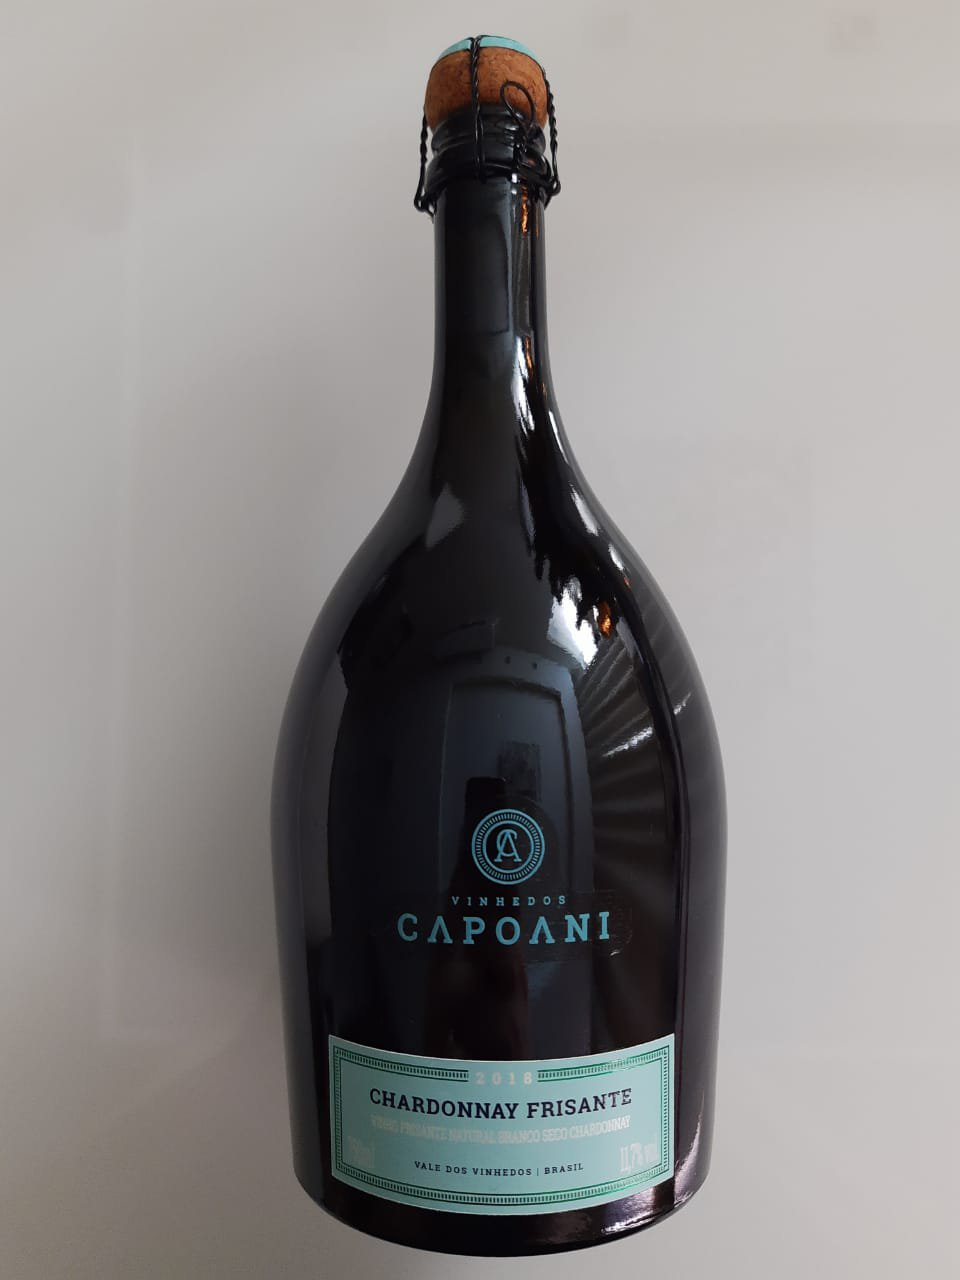 Vinho Vinhedos Capoani Chardonnay Frisante 750ml